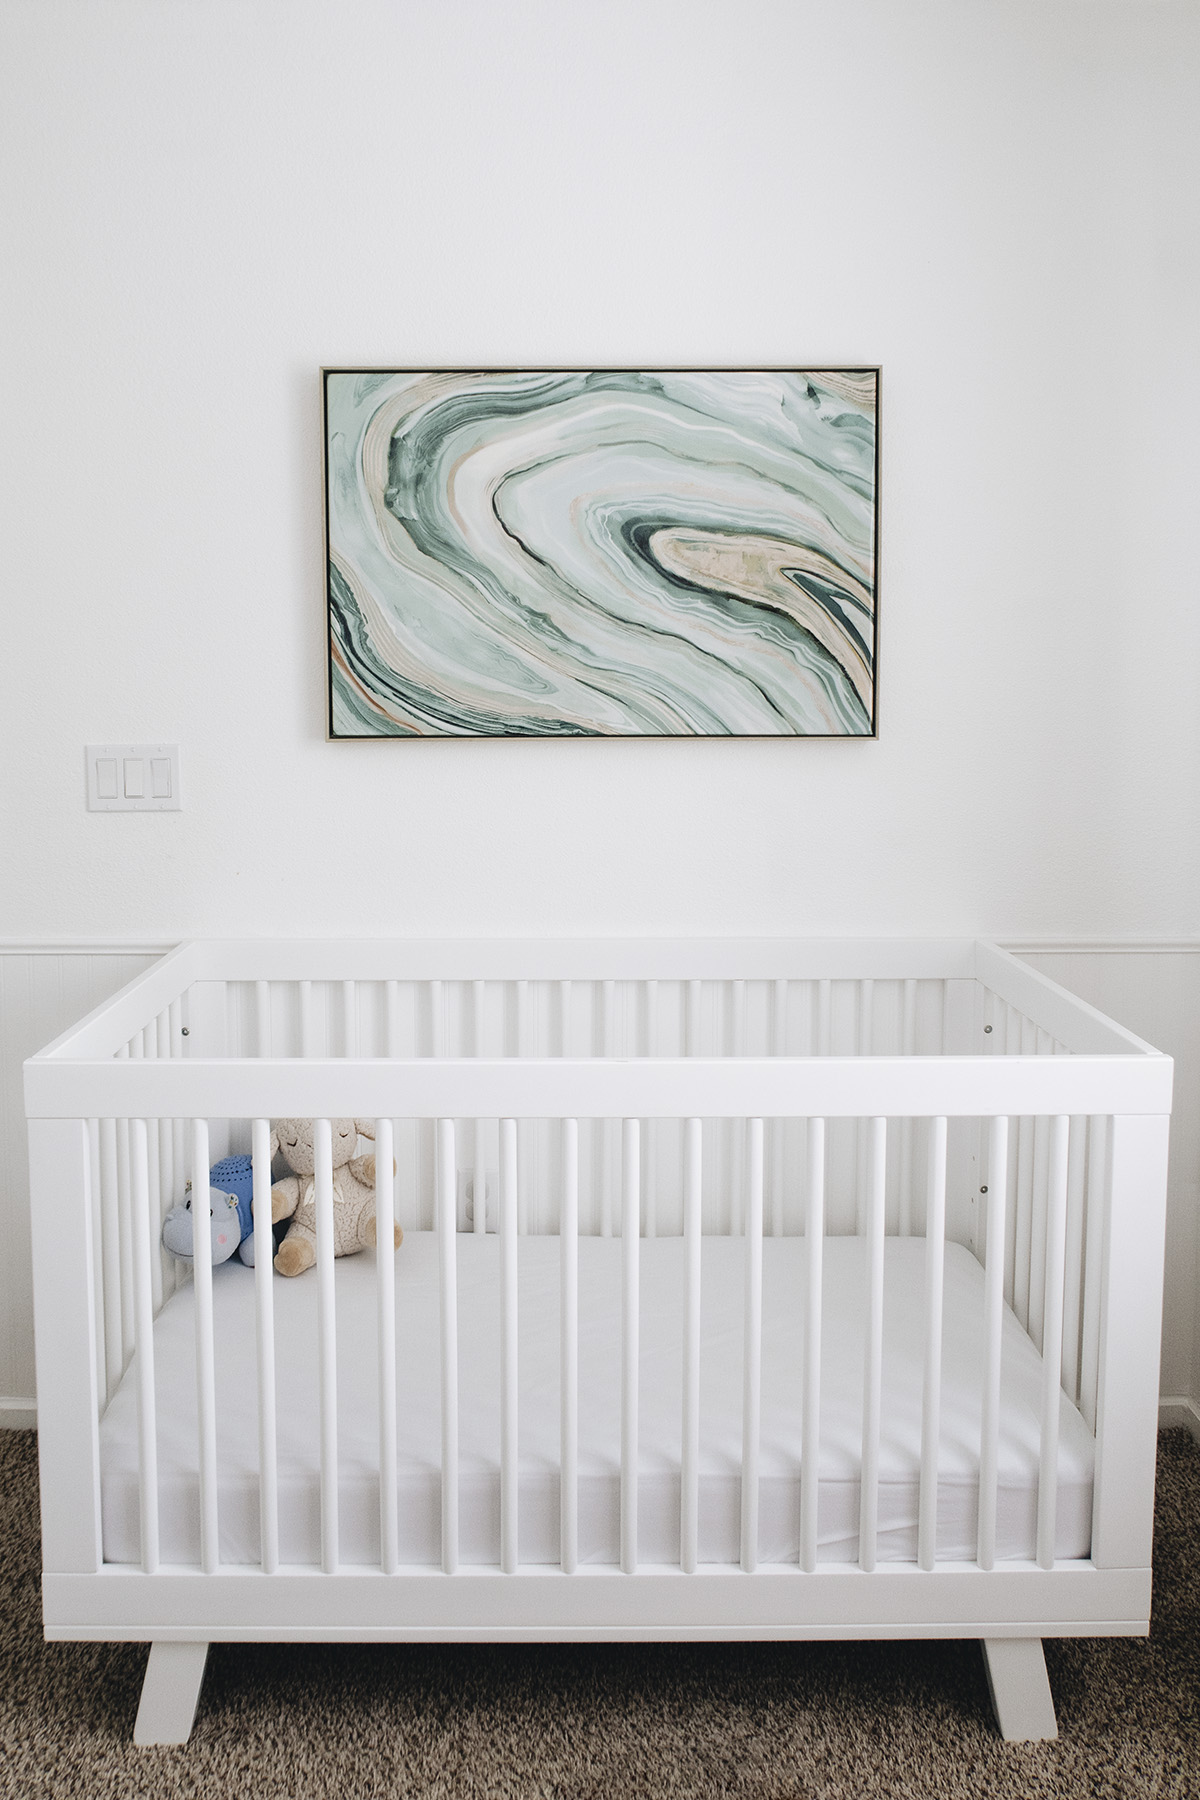 modern artwork on top of a white modern crib